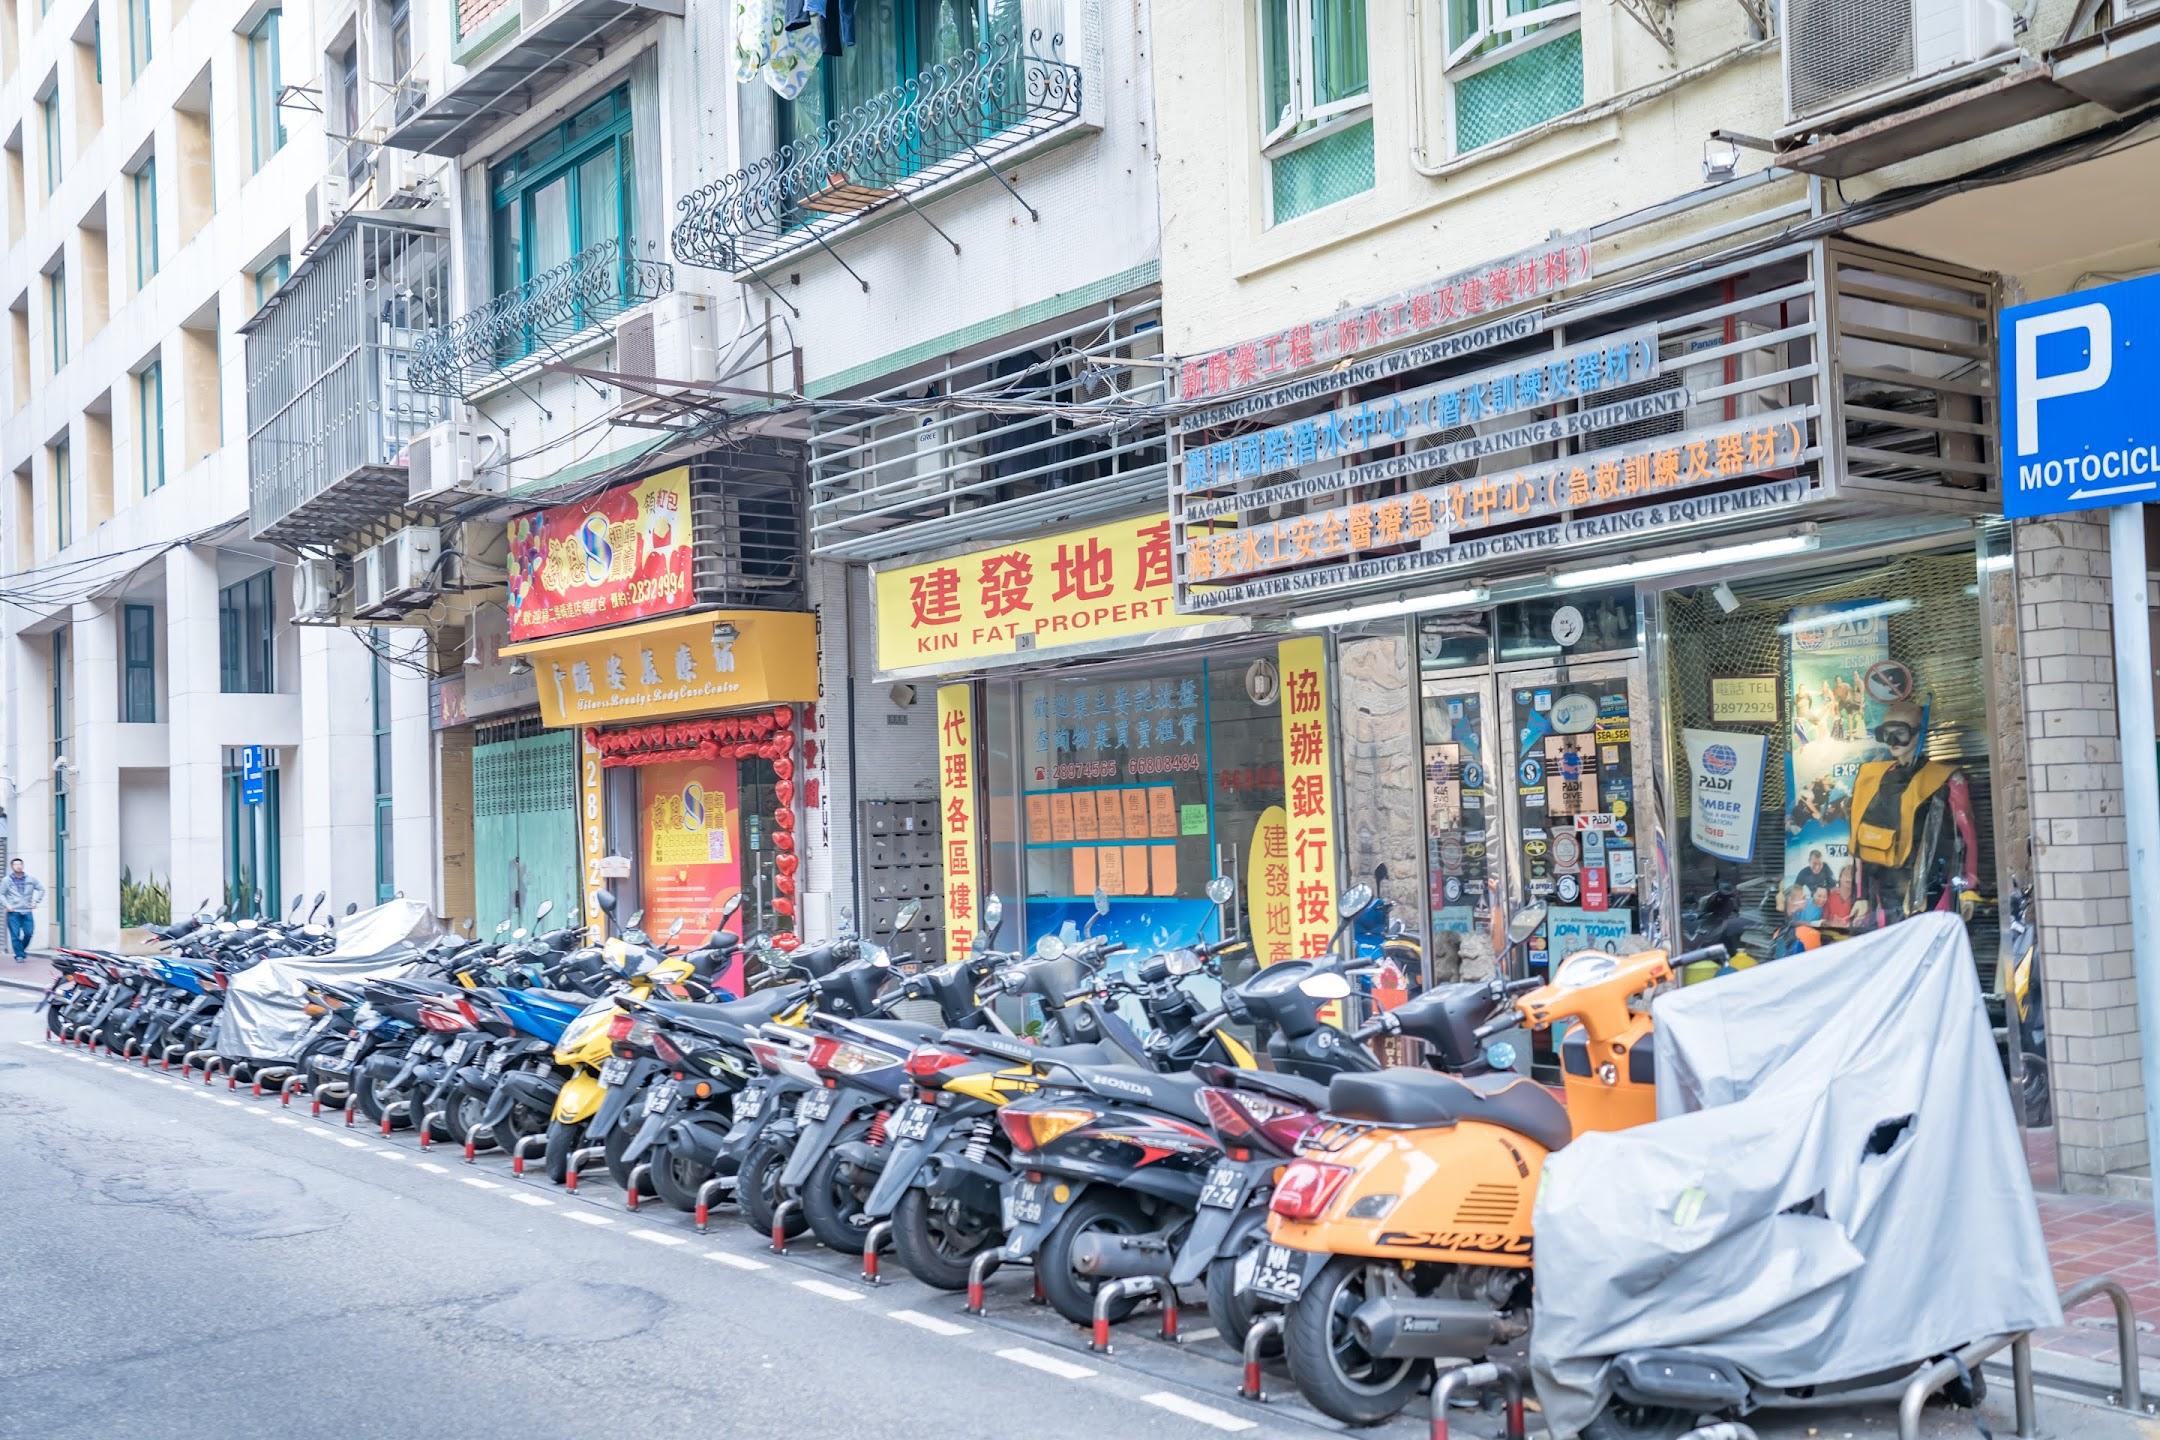 Macau off-street1